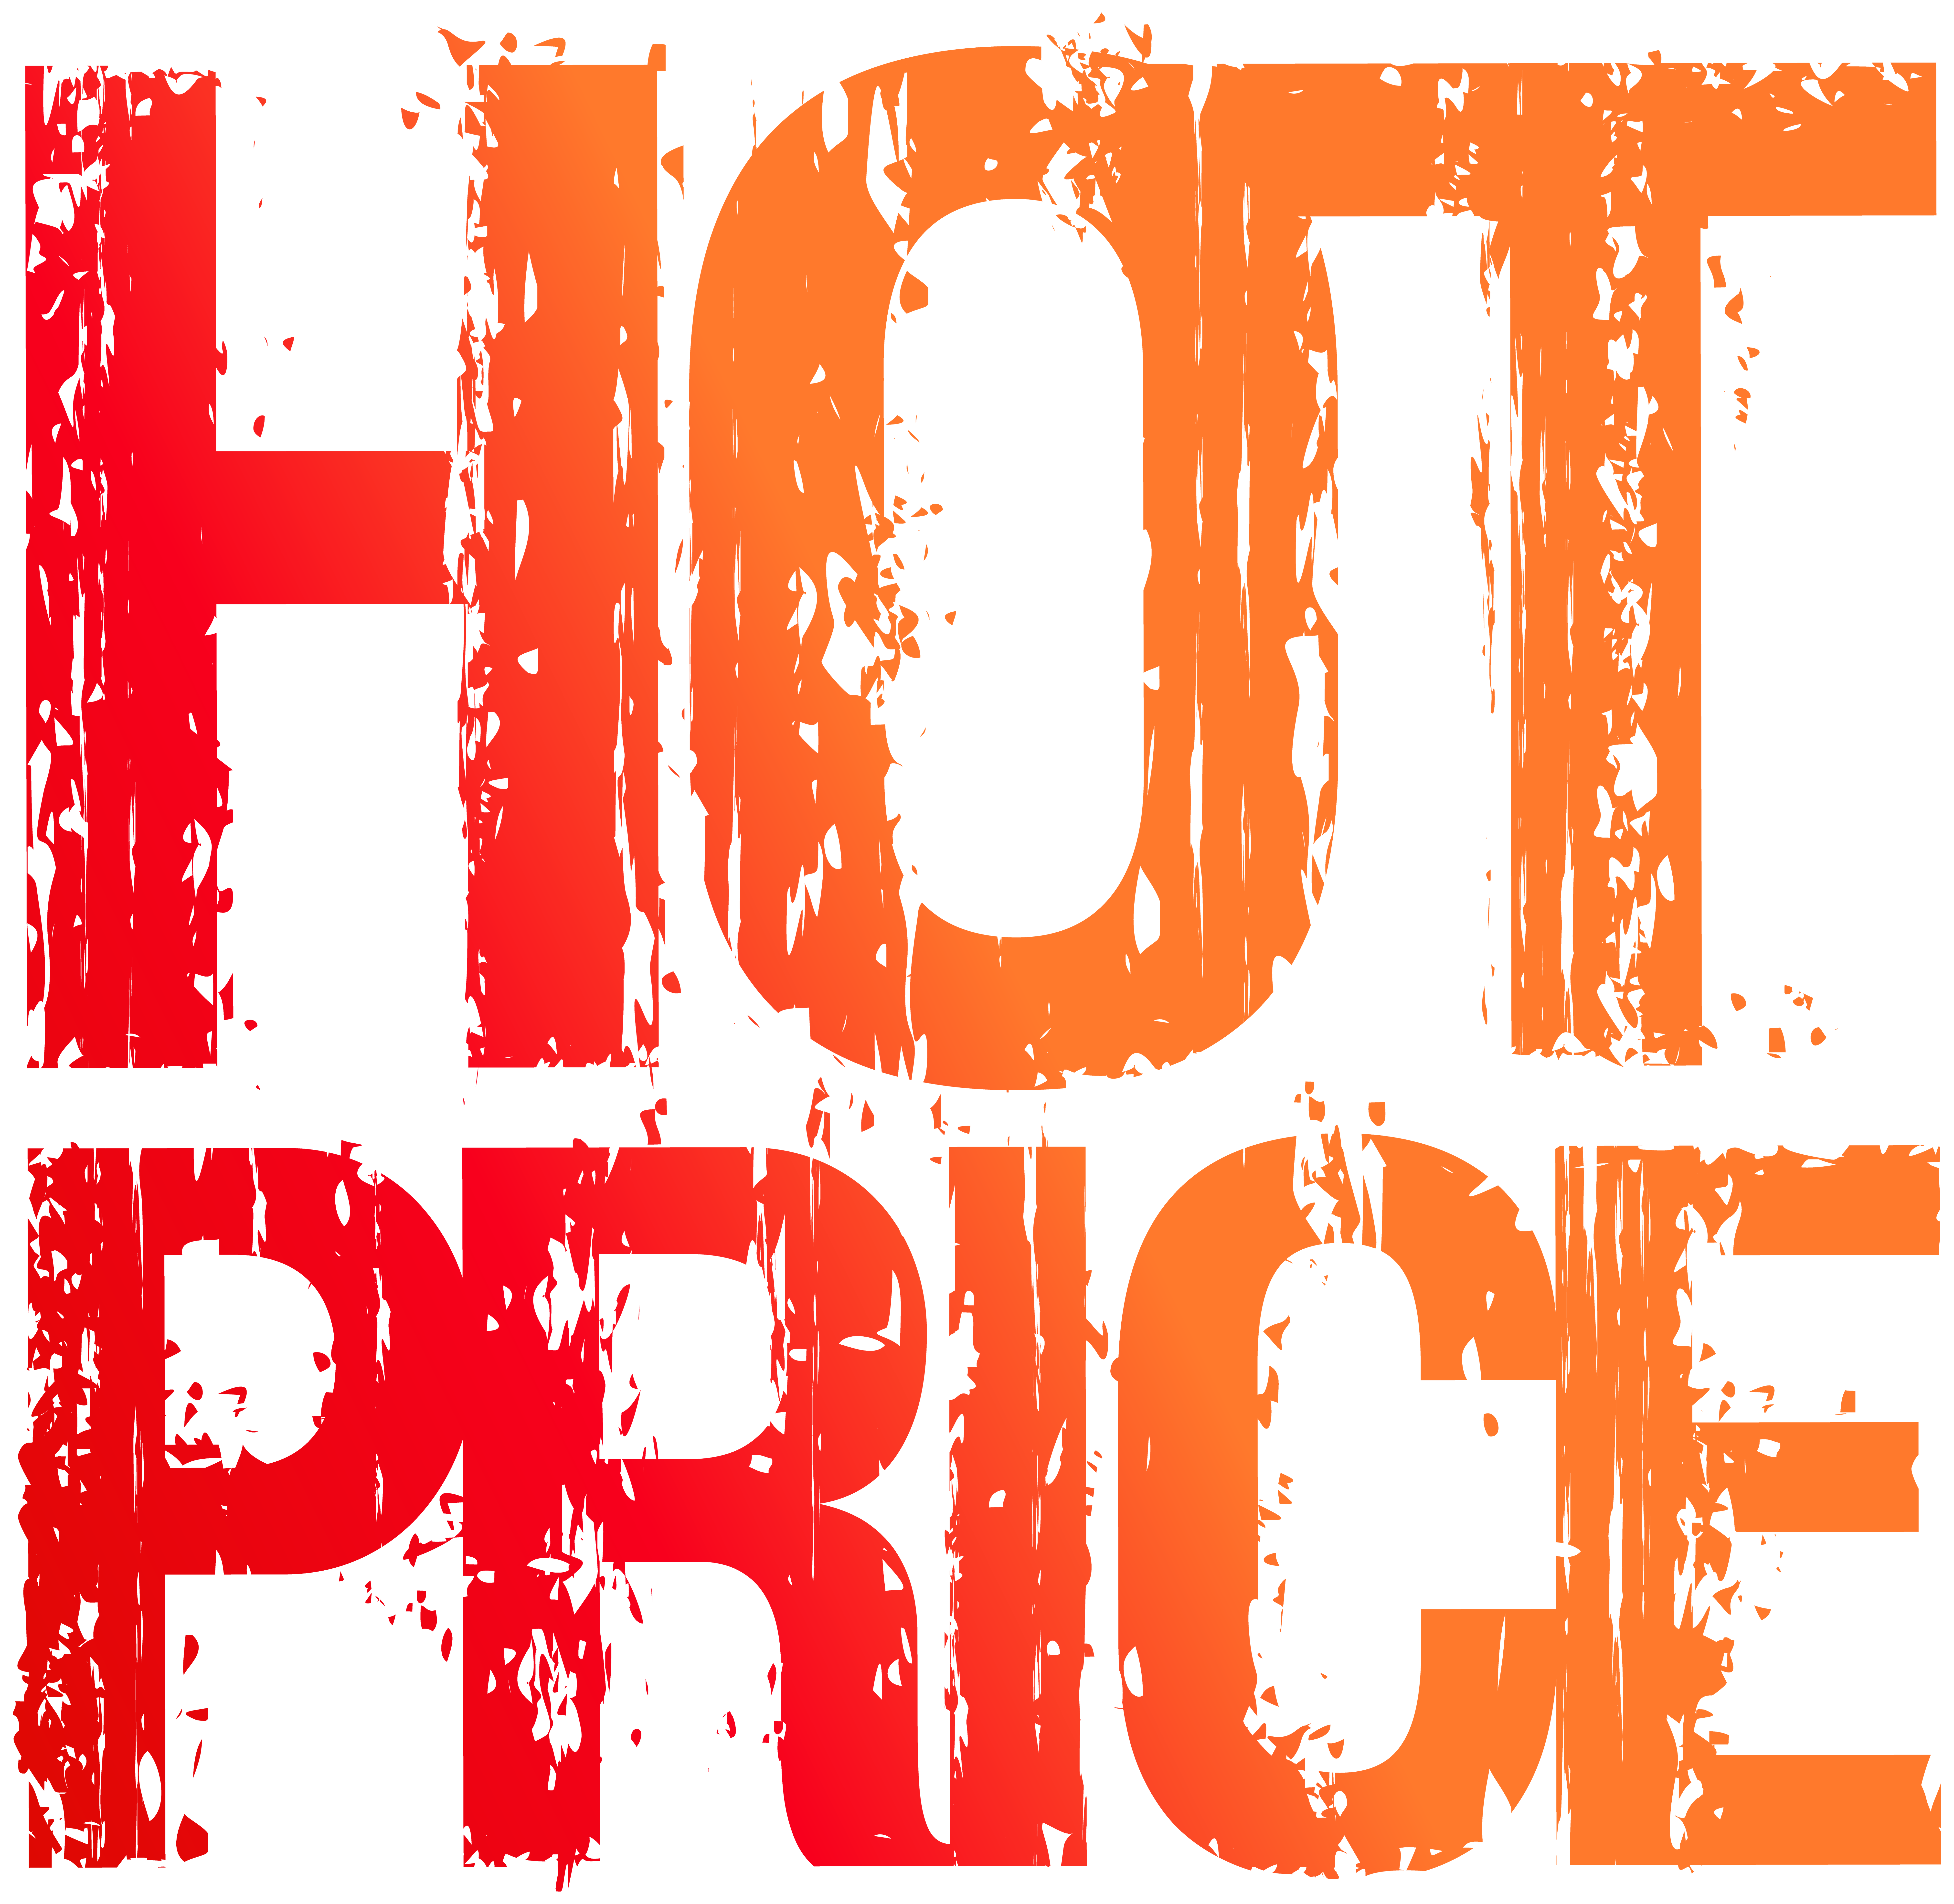 Hot Price Stamp PNG Clip Art Image.